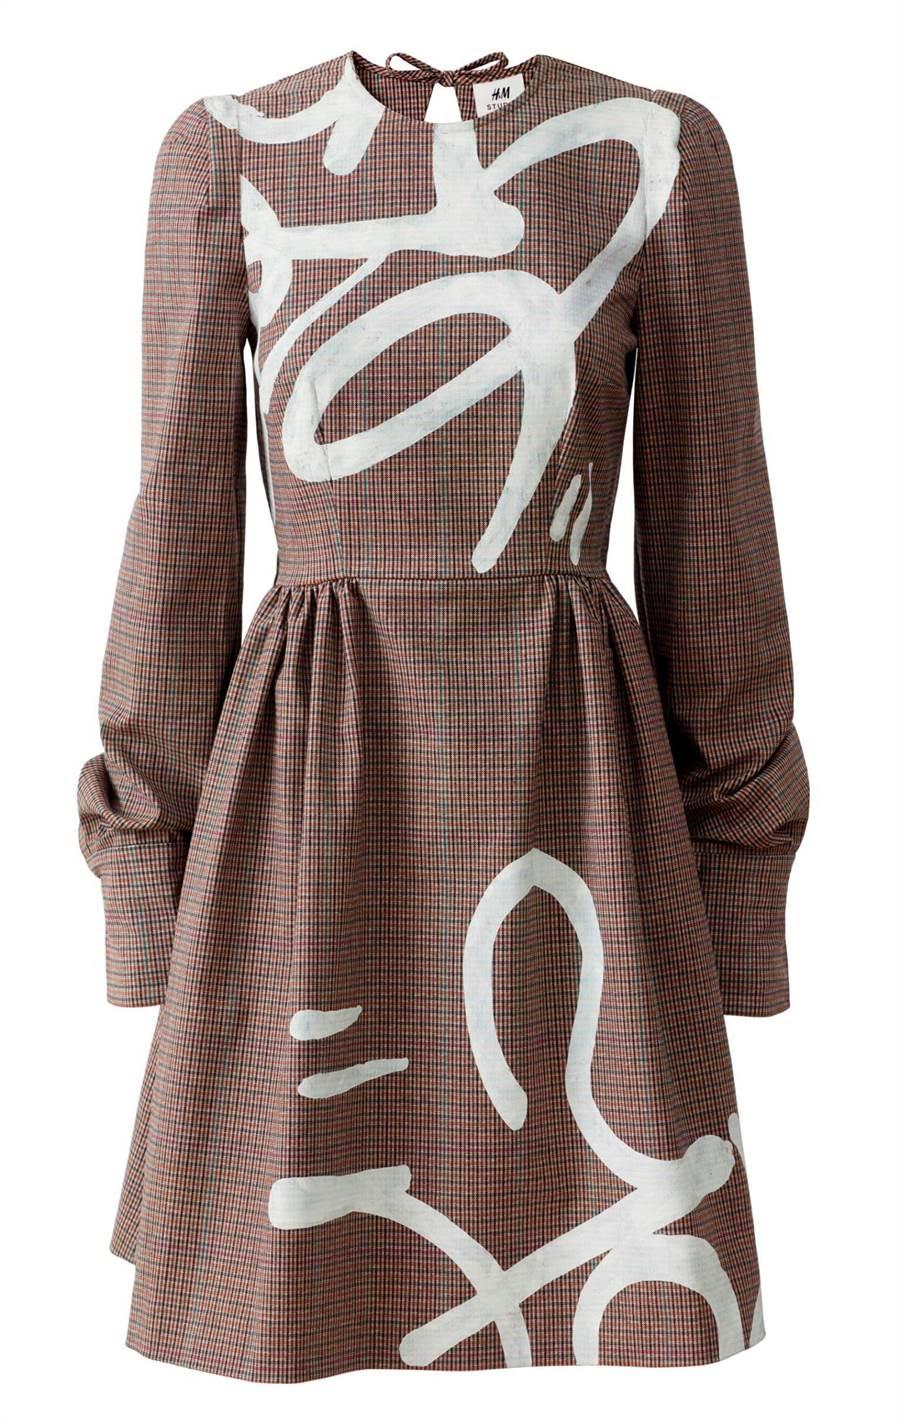 H&M Studio x colette系列塗鴉洋裝/150歐元(台灣未訂價)(H&M提供)